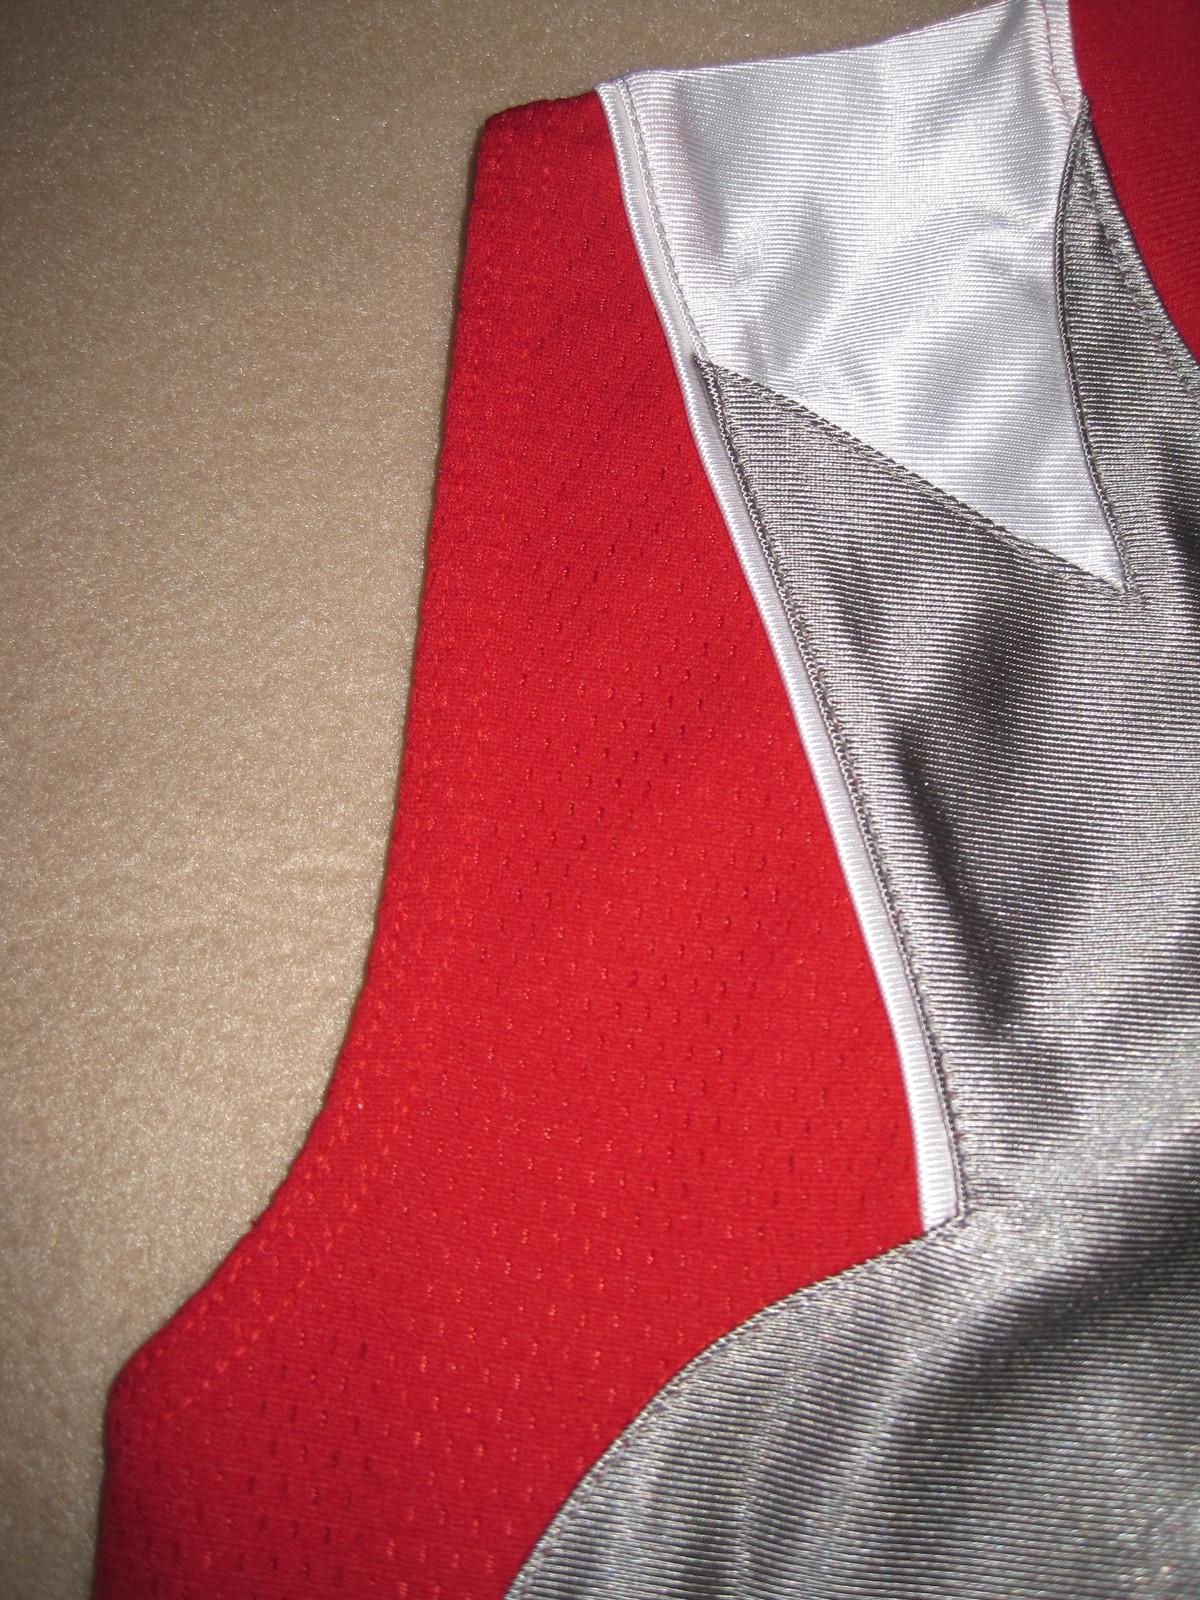 BOYS 6 - Nike - Flight Grey-Red-White BASKETBALL SPORTS JERSEY image 2